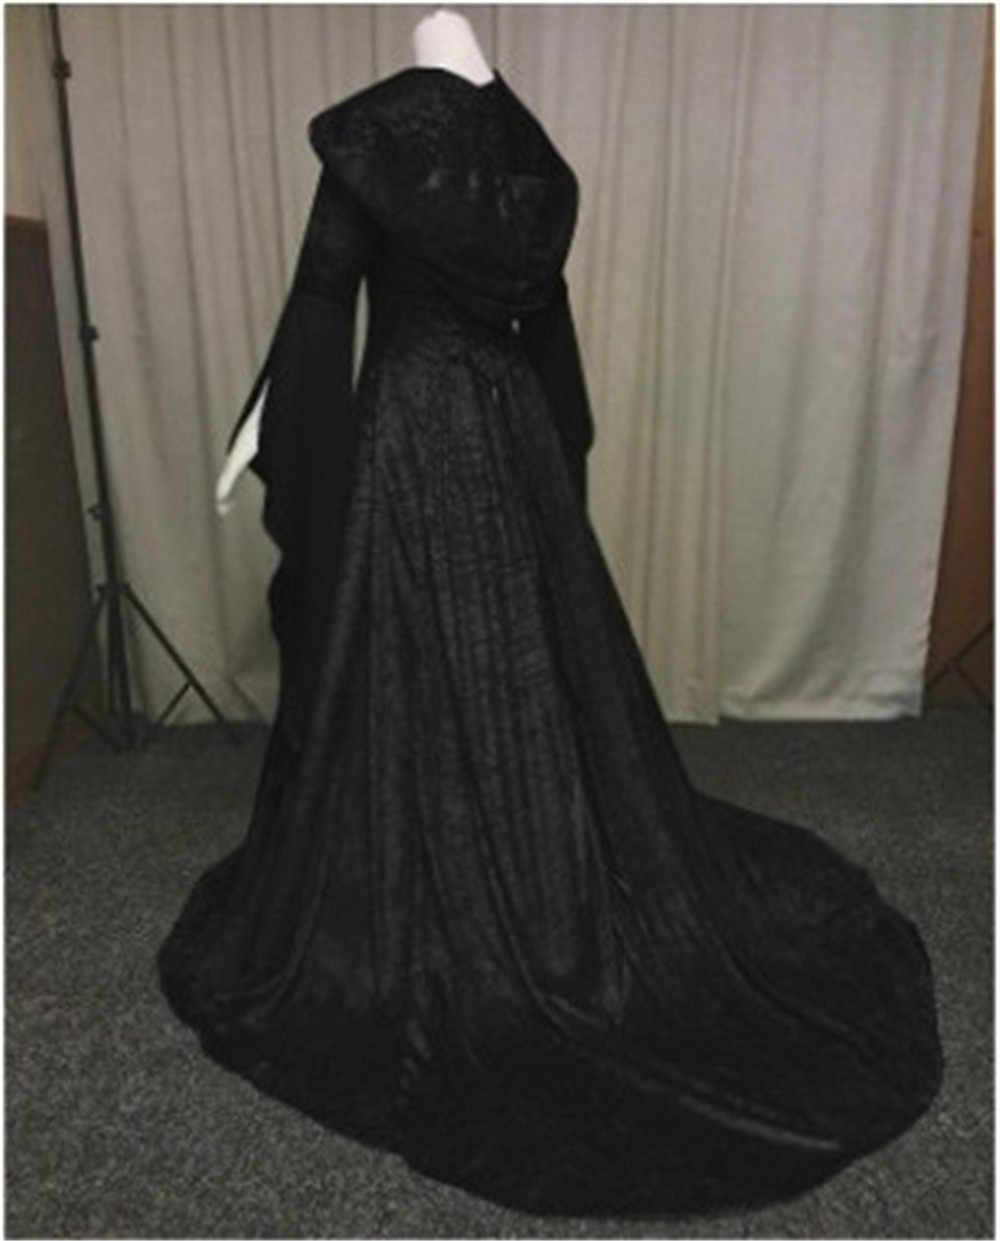 Pagan Wedding Dresses.New Women Vintage Medieval Pagan Wedding Hooded Dress Romantic Fantasy Gown Floor Length Renaissance Dress Cosplay Retro Witch